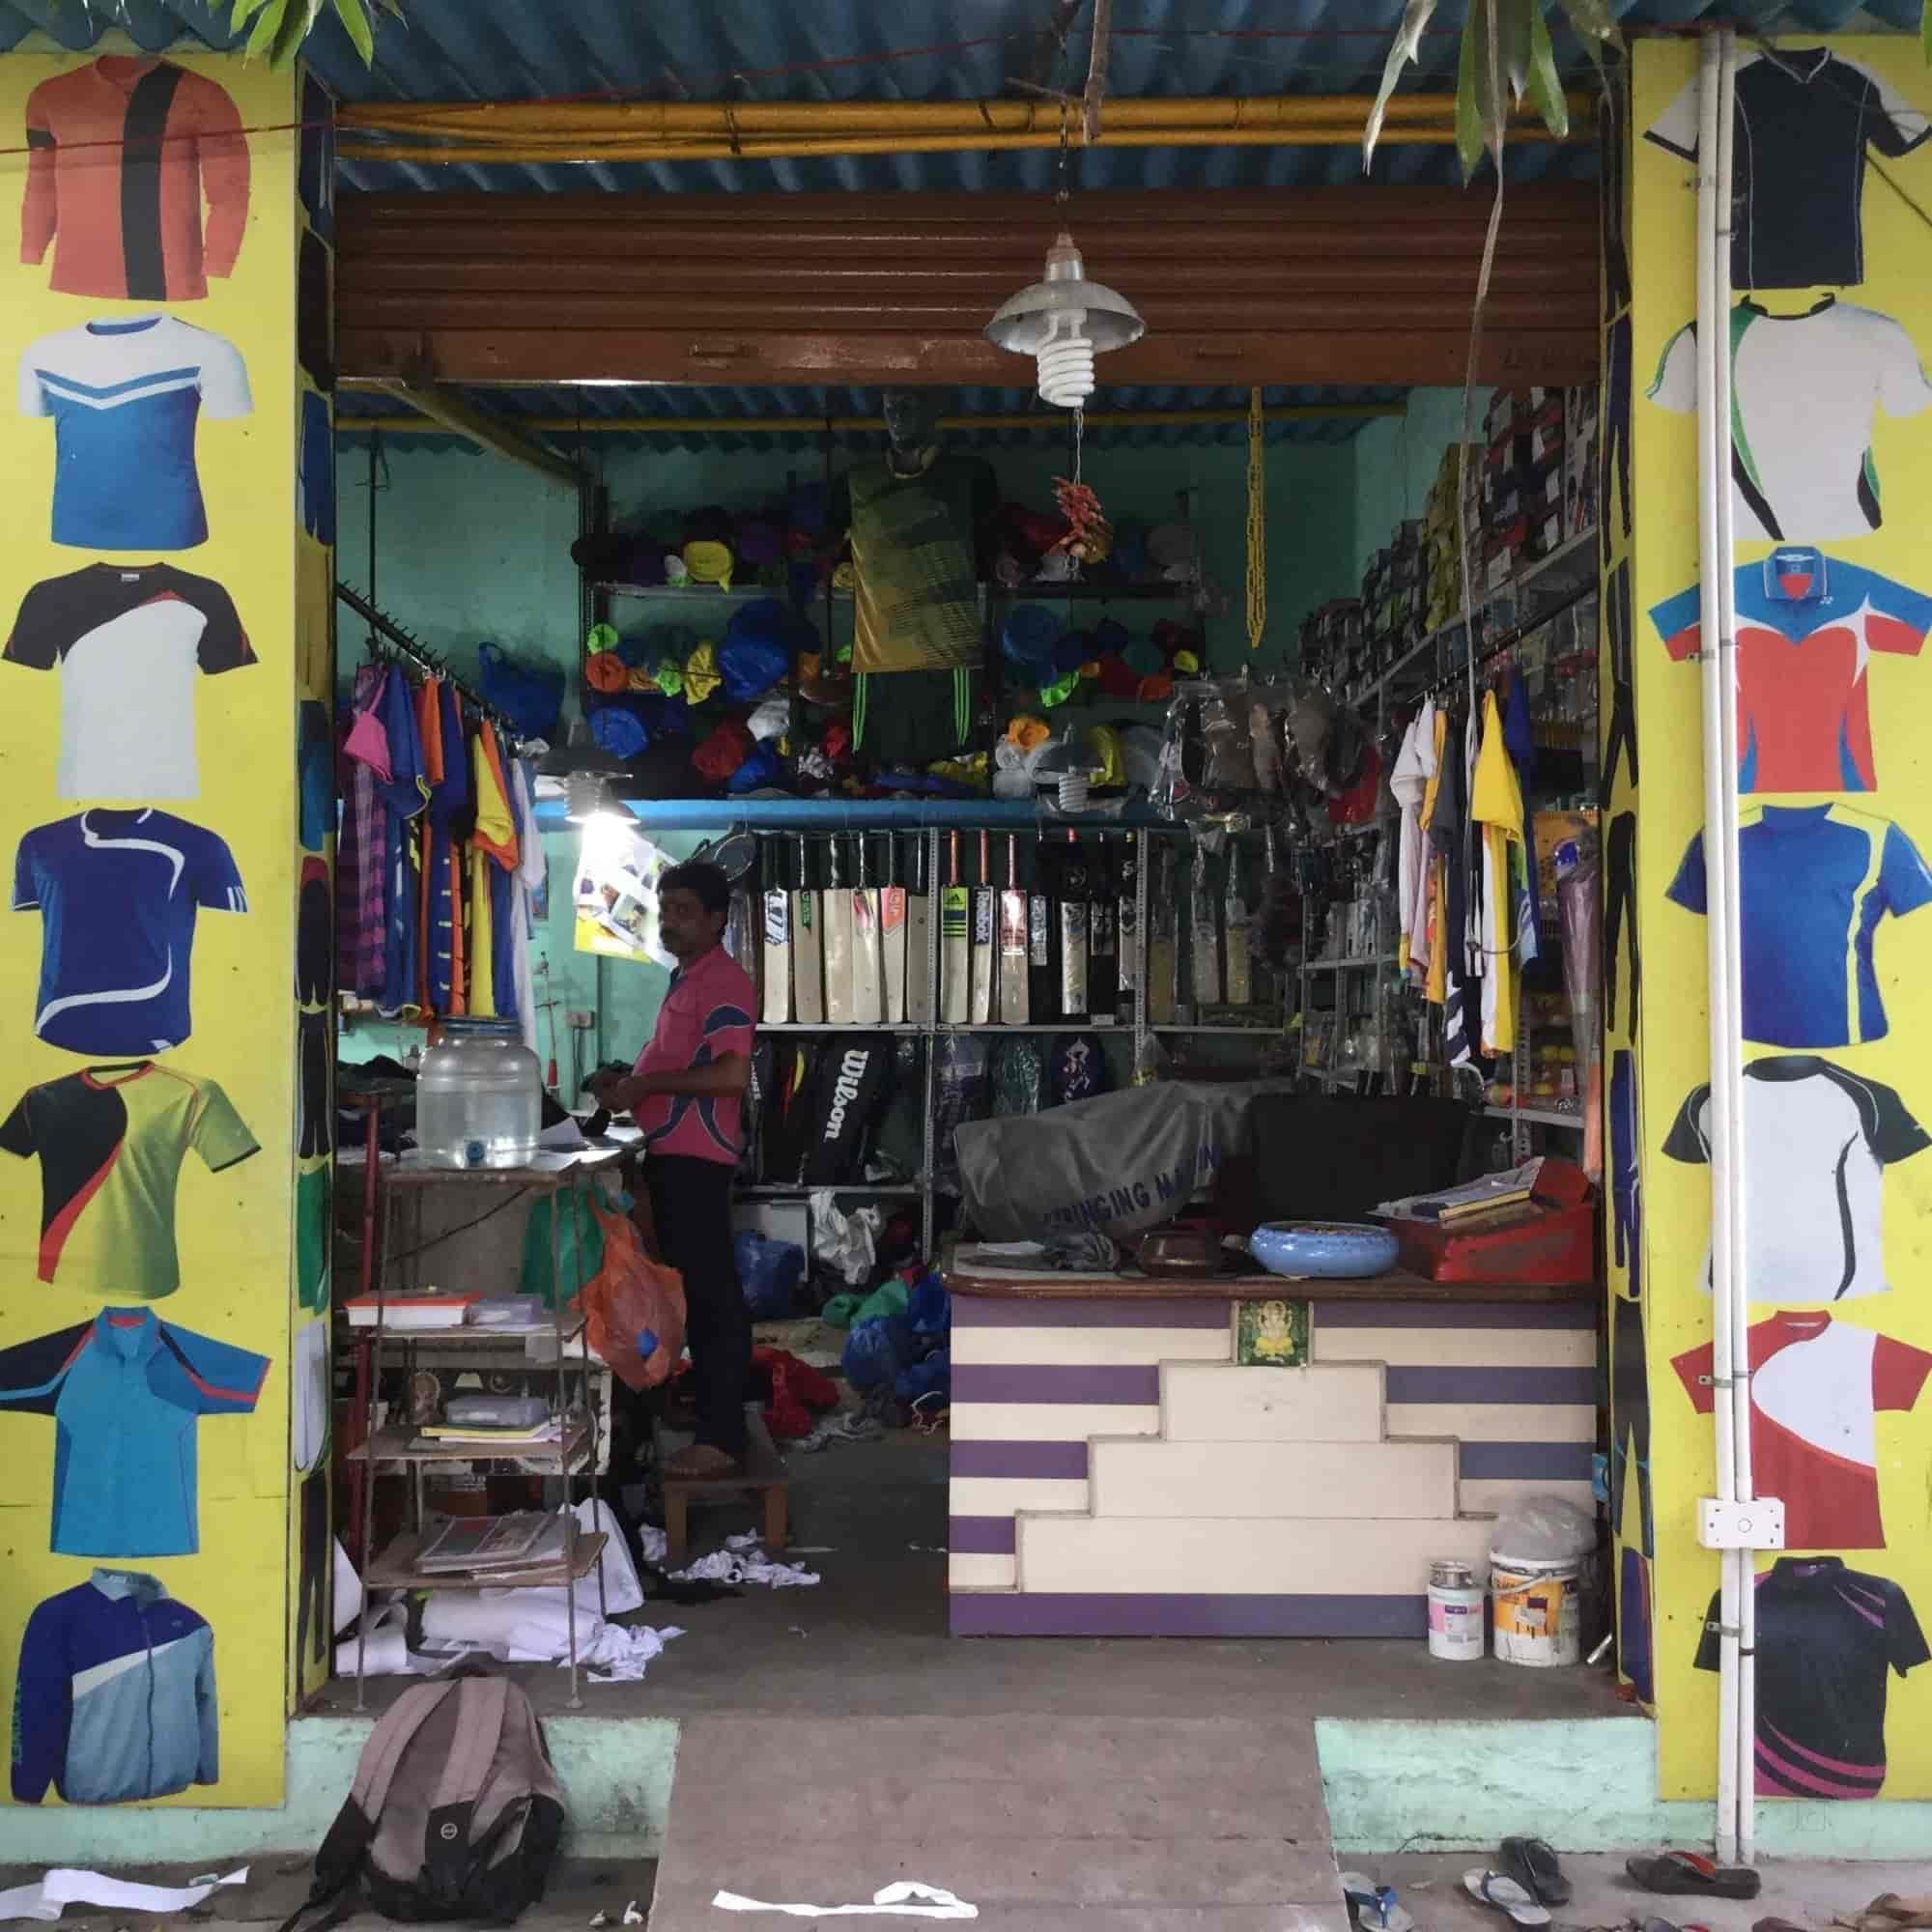 Sachin sports wear moolakadai madhavaram sports goods dealers in sachin sports wear moolakadai madhavaram sports goods dealers in chennai justdial solutioingenieria Image collections